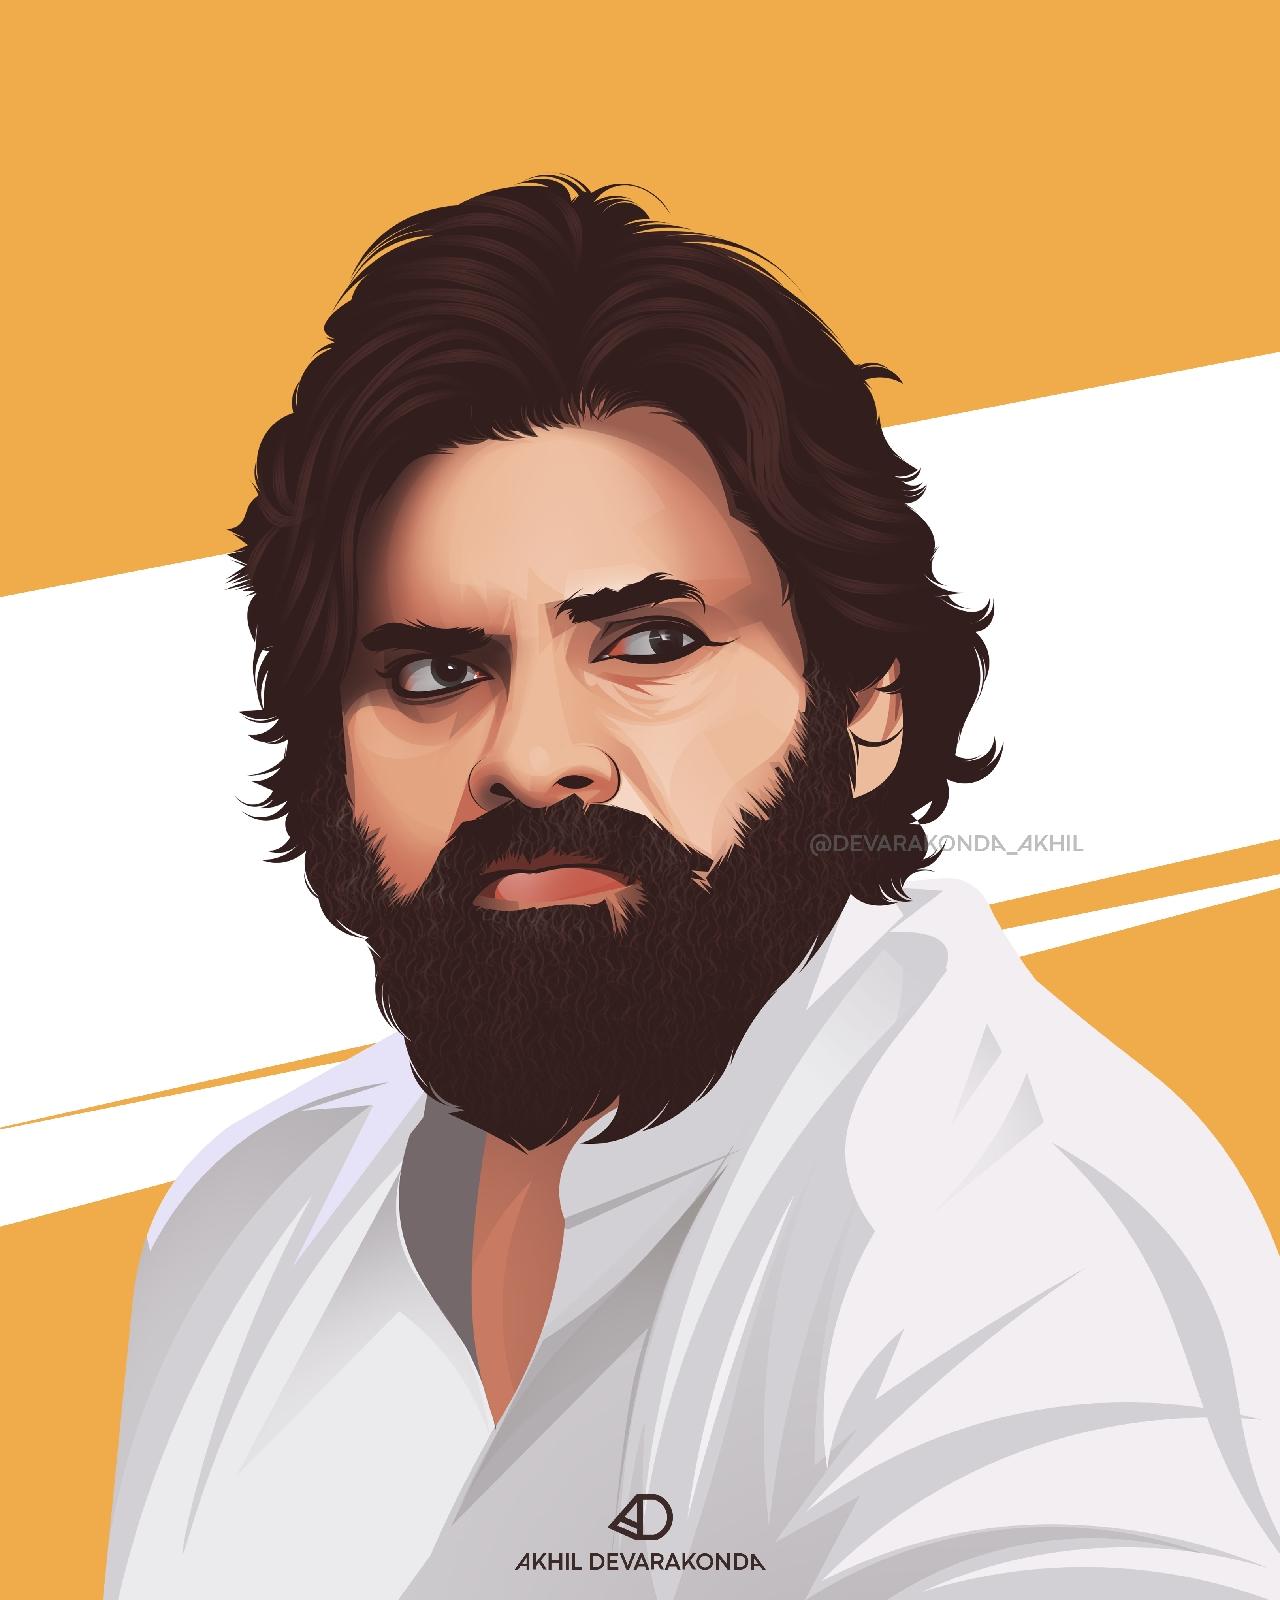 Pawan Kalyan Vector Artwork - Akhil Devarakonda